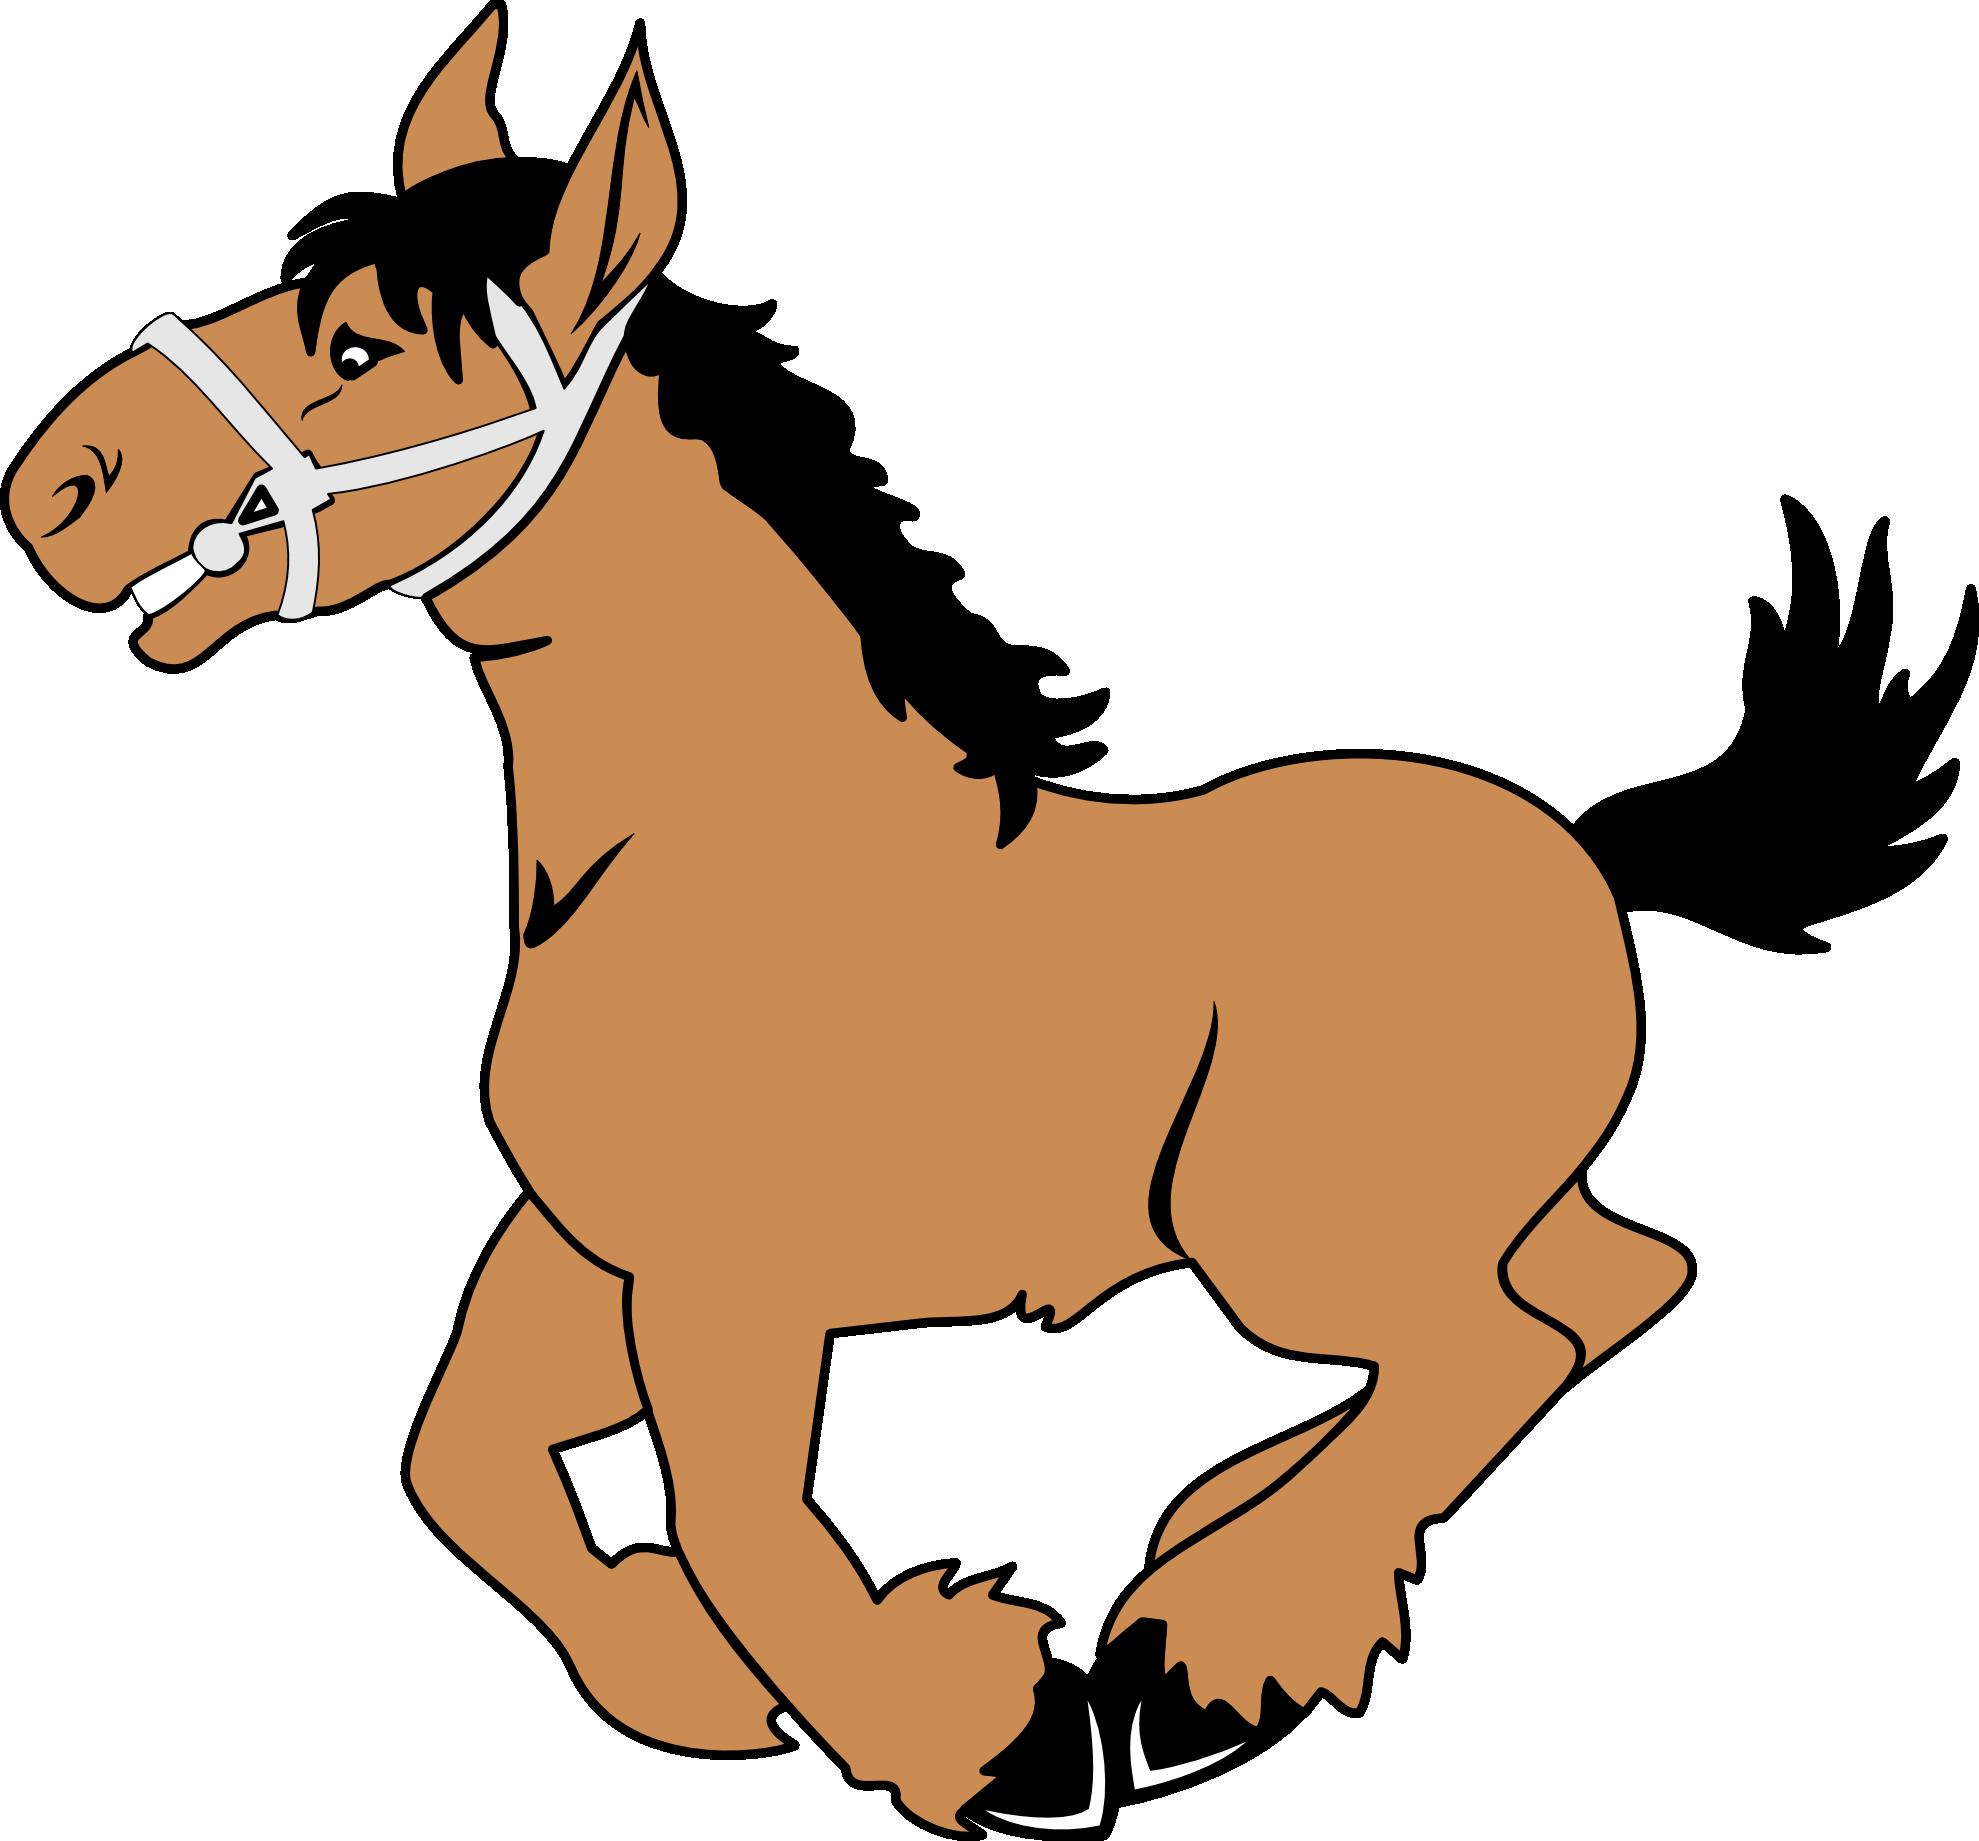 Clip Art Horse - Clipart library-Clip Art Horse - Clipart library-3